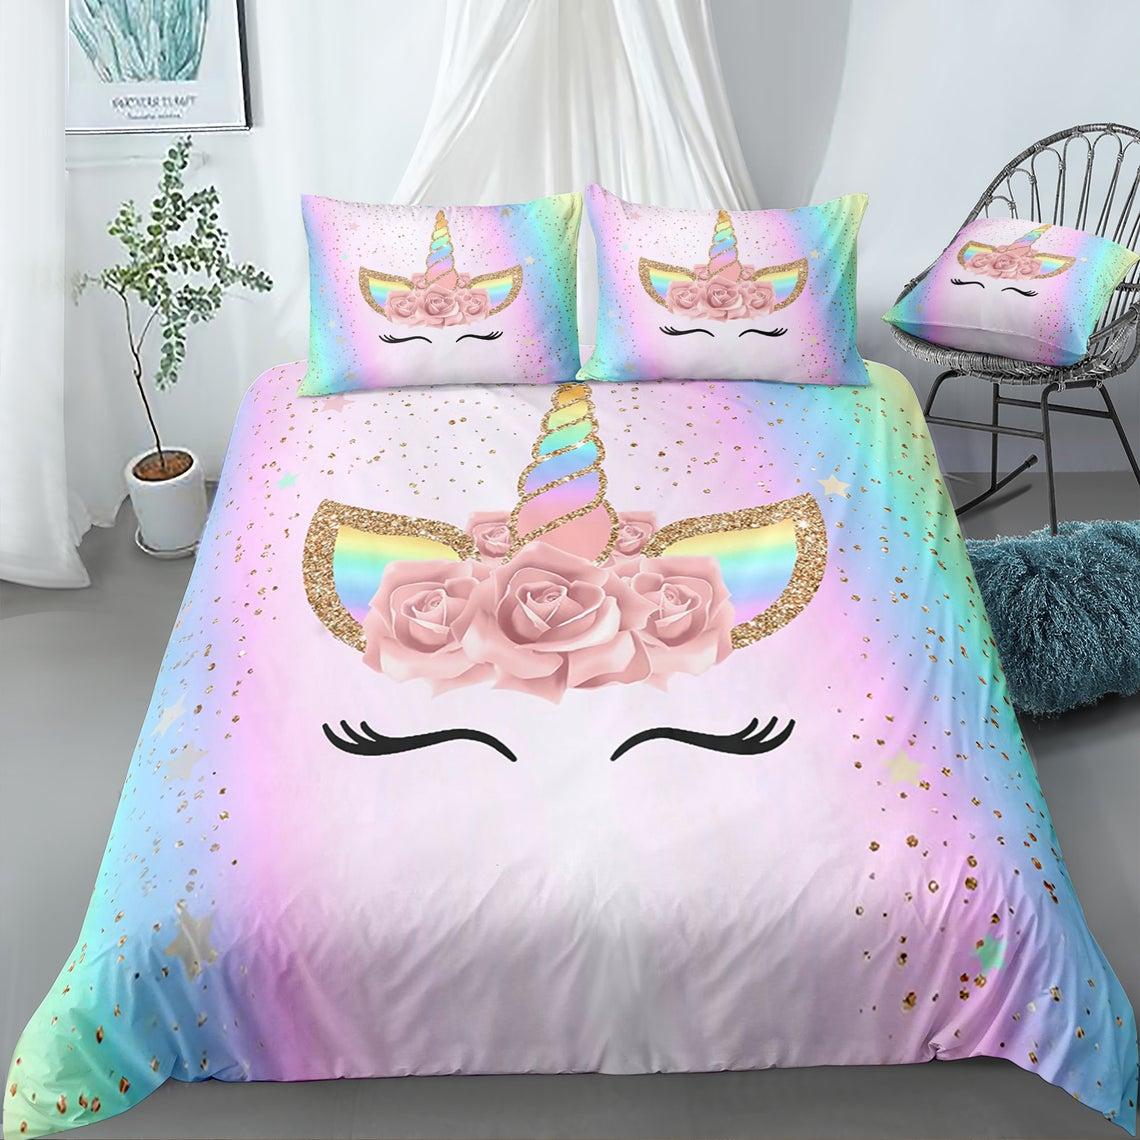 lovely unicorn floral bedding set 2